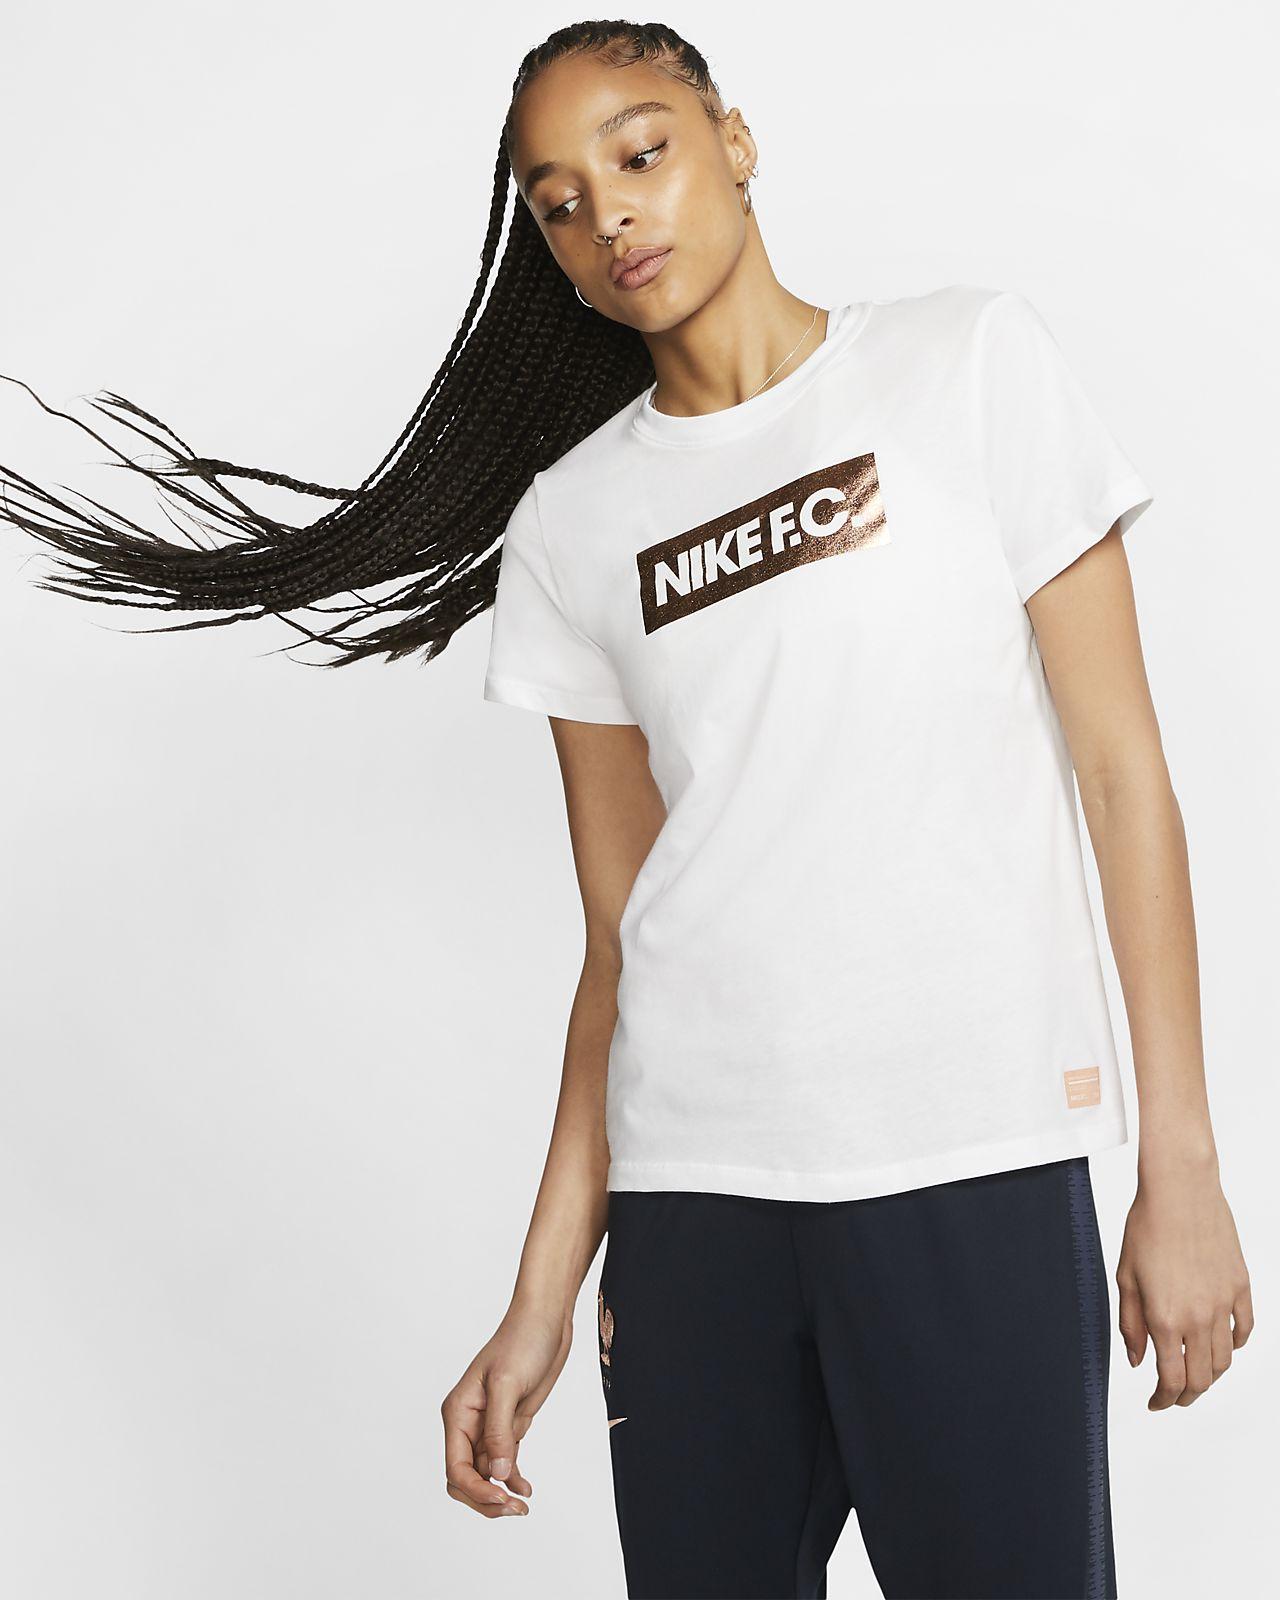 Tee-shirt de football Nike F.C. pour Femme